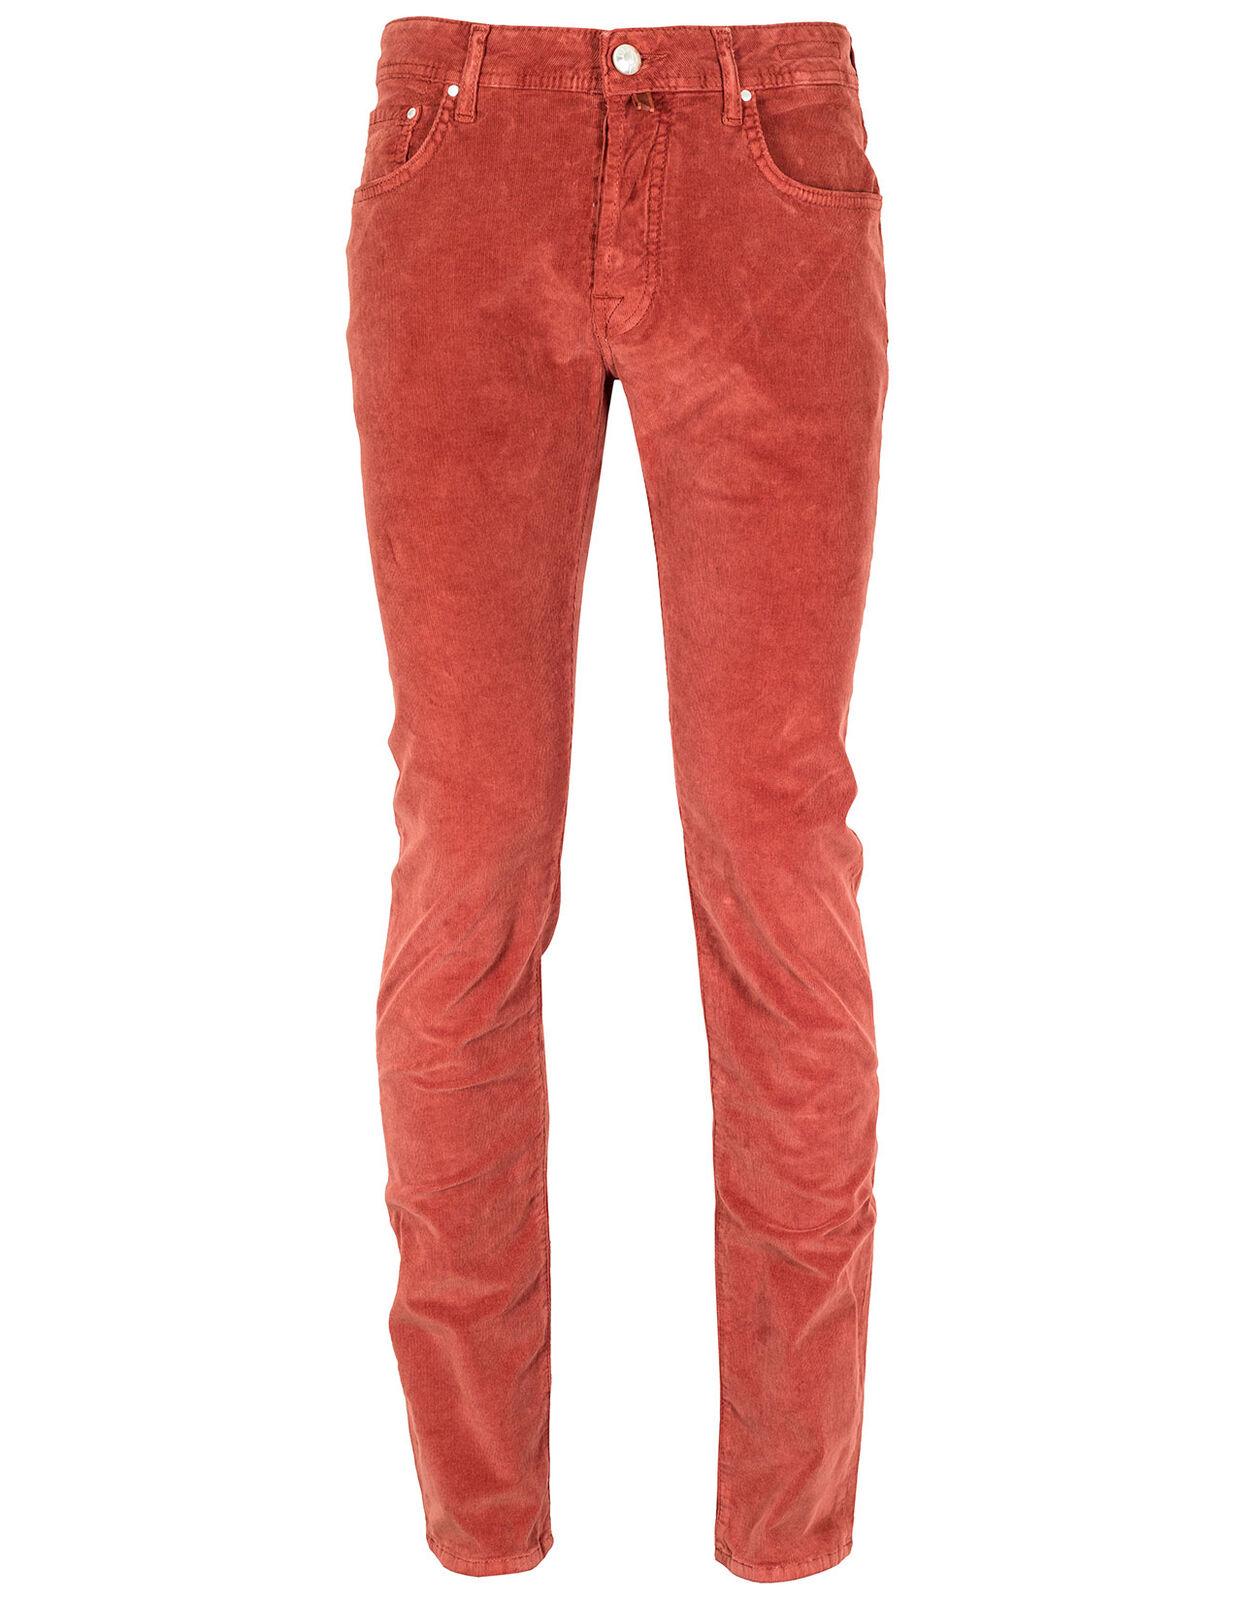 Jacob Cohen Cord Pantaloni pw688 pw688 pw688 comfort in rosso 3e43ba